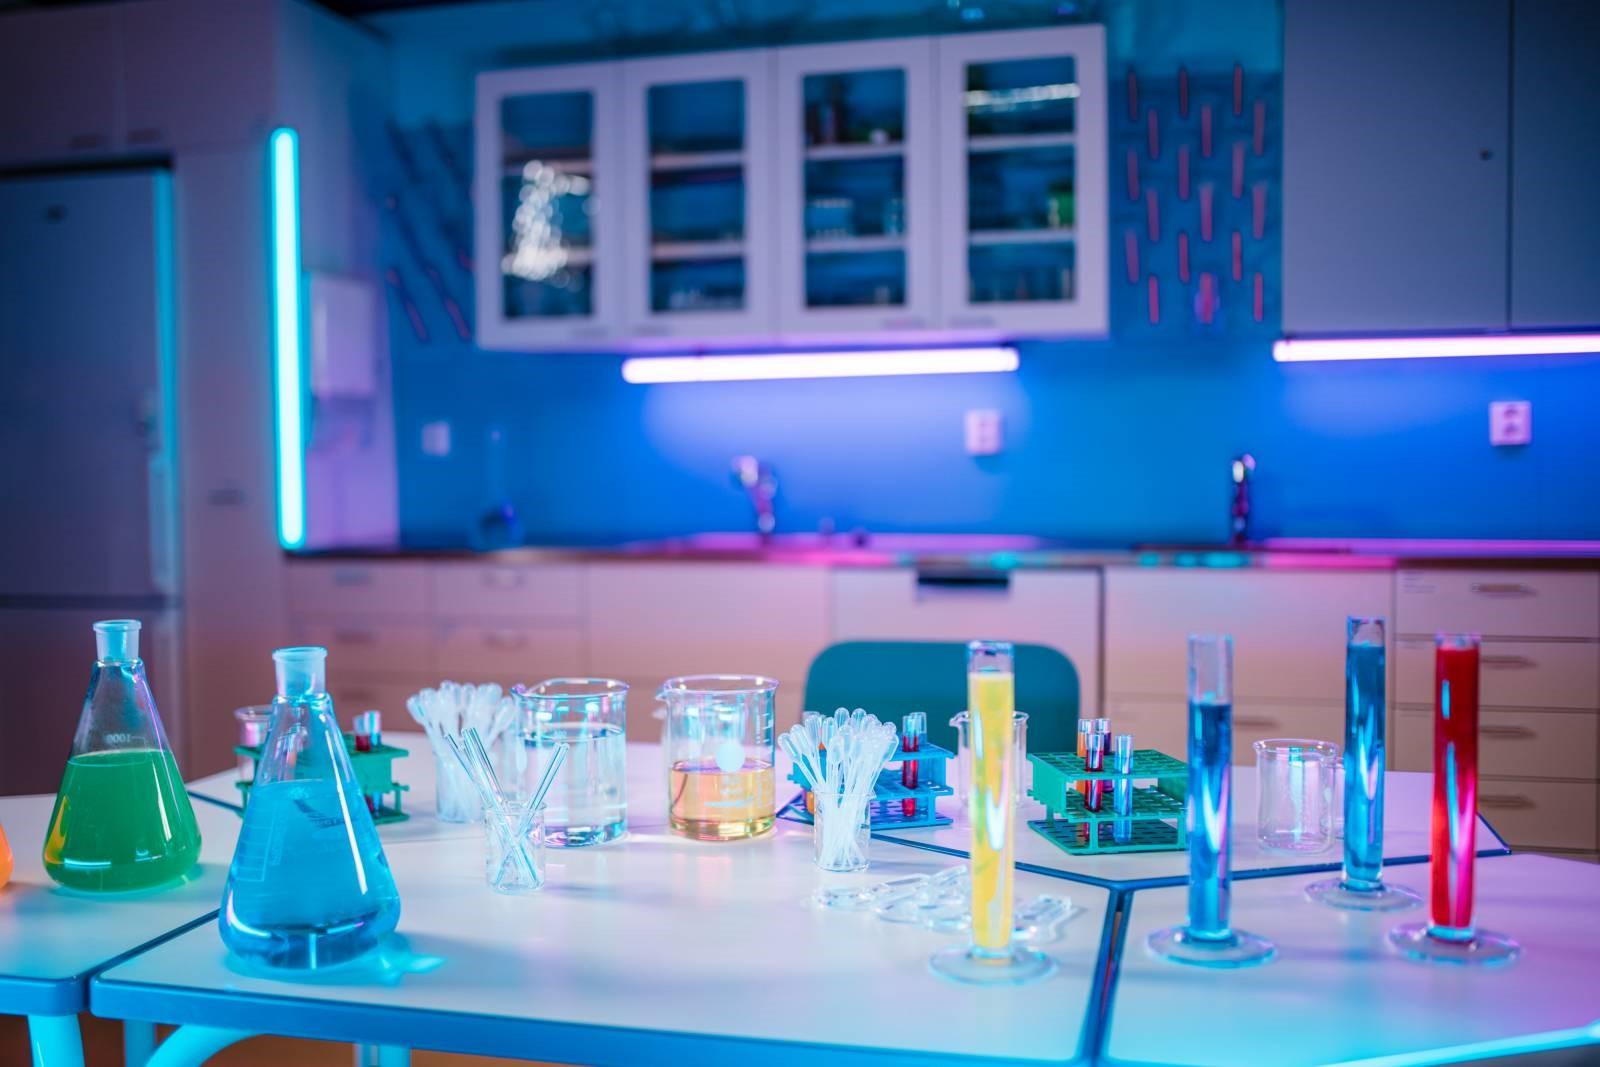 Laboratoriossa erilaisia koeputkia.